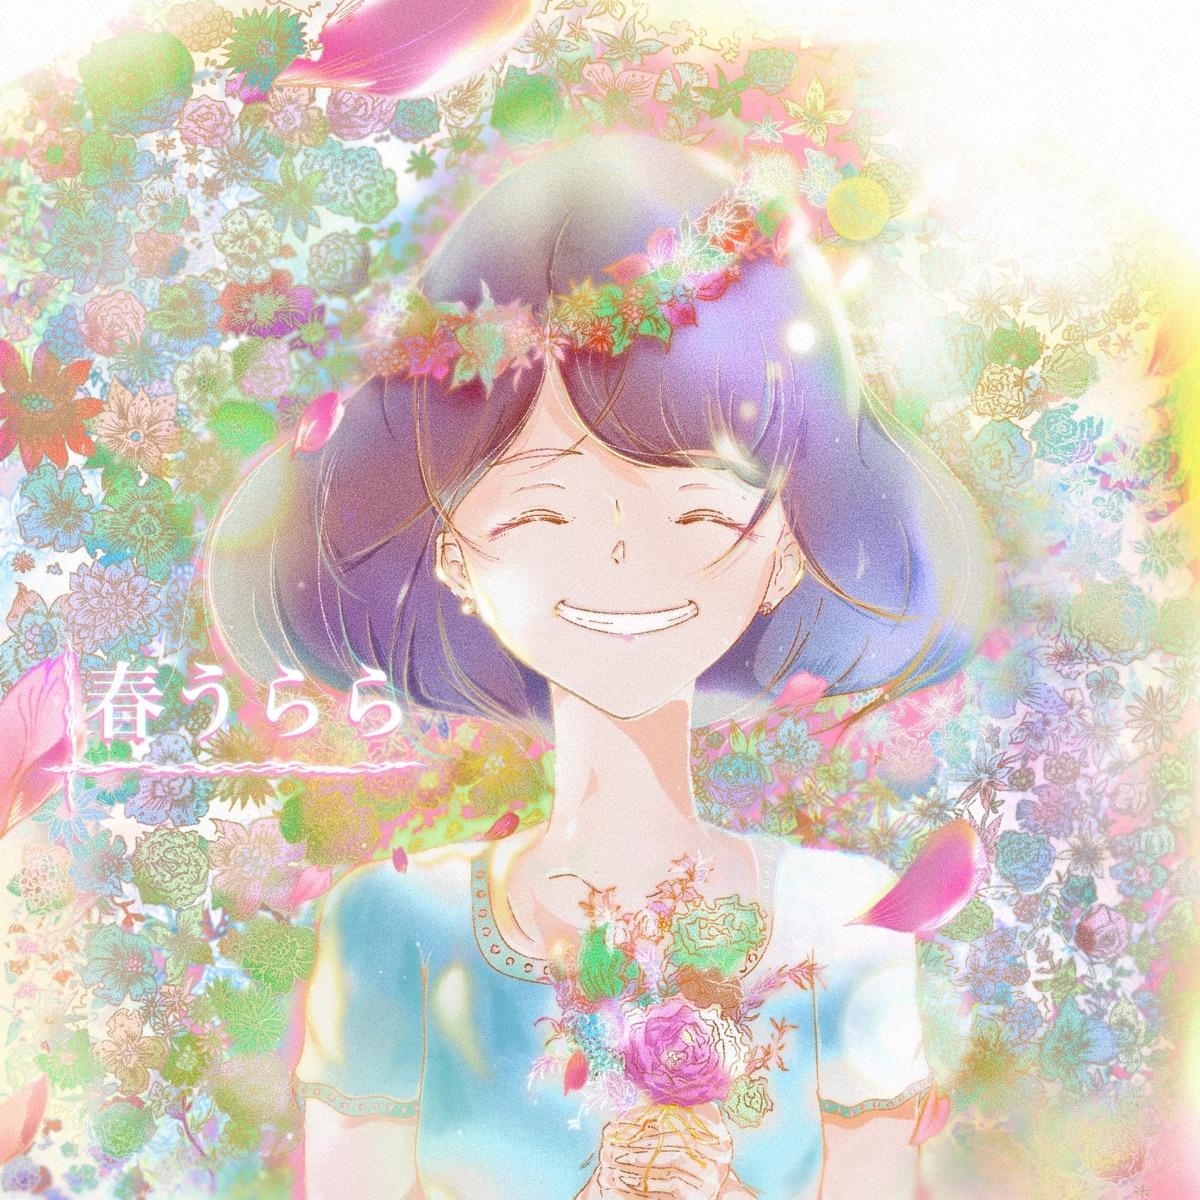 GENIC - 春うらら [2021.04.05+MP3+RAR]